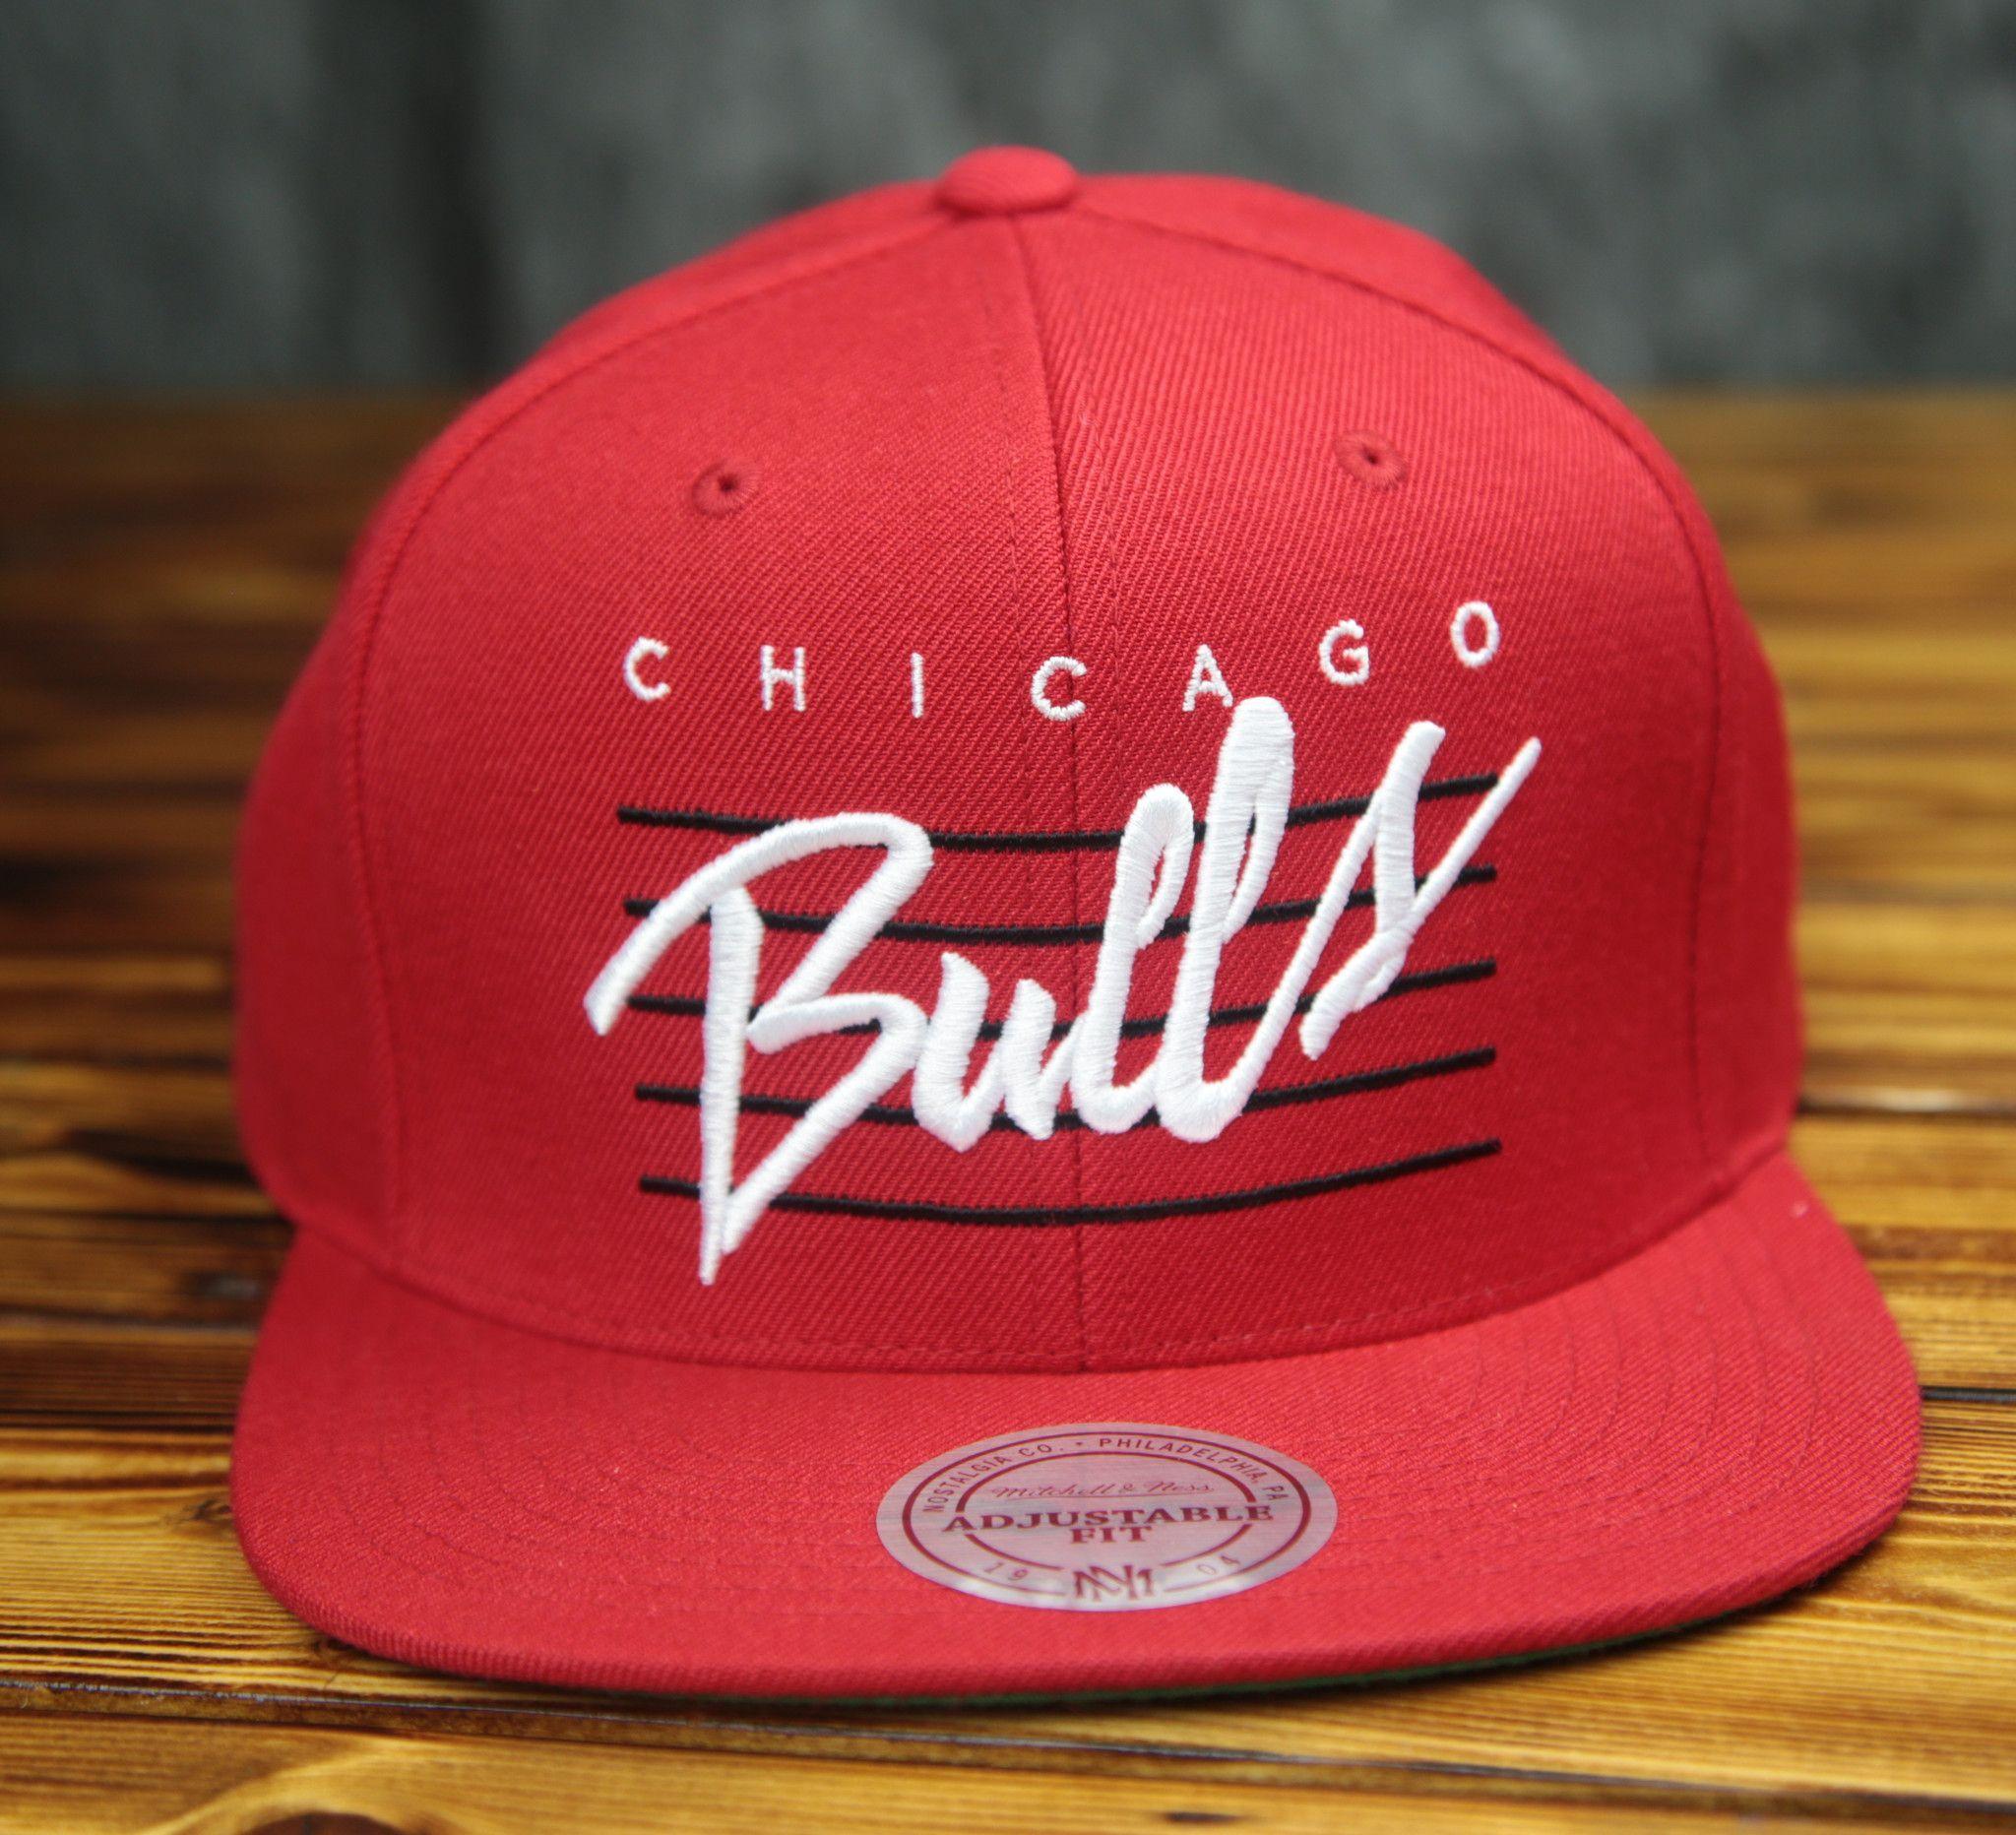 65a98519fb4 Chicago Bulls Mitchell   Ness Cursive Retro Script Snapback Hat ...